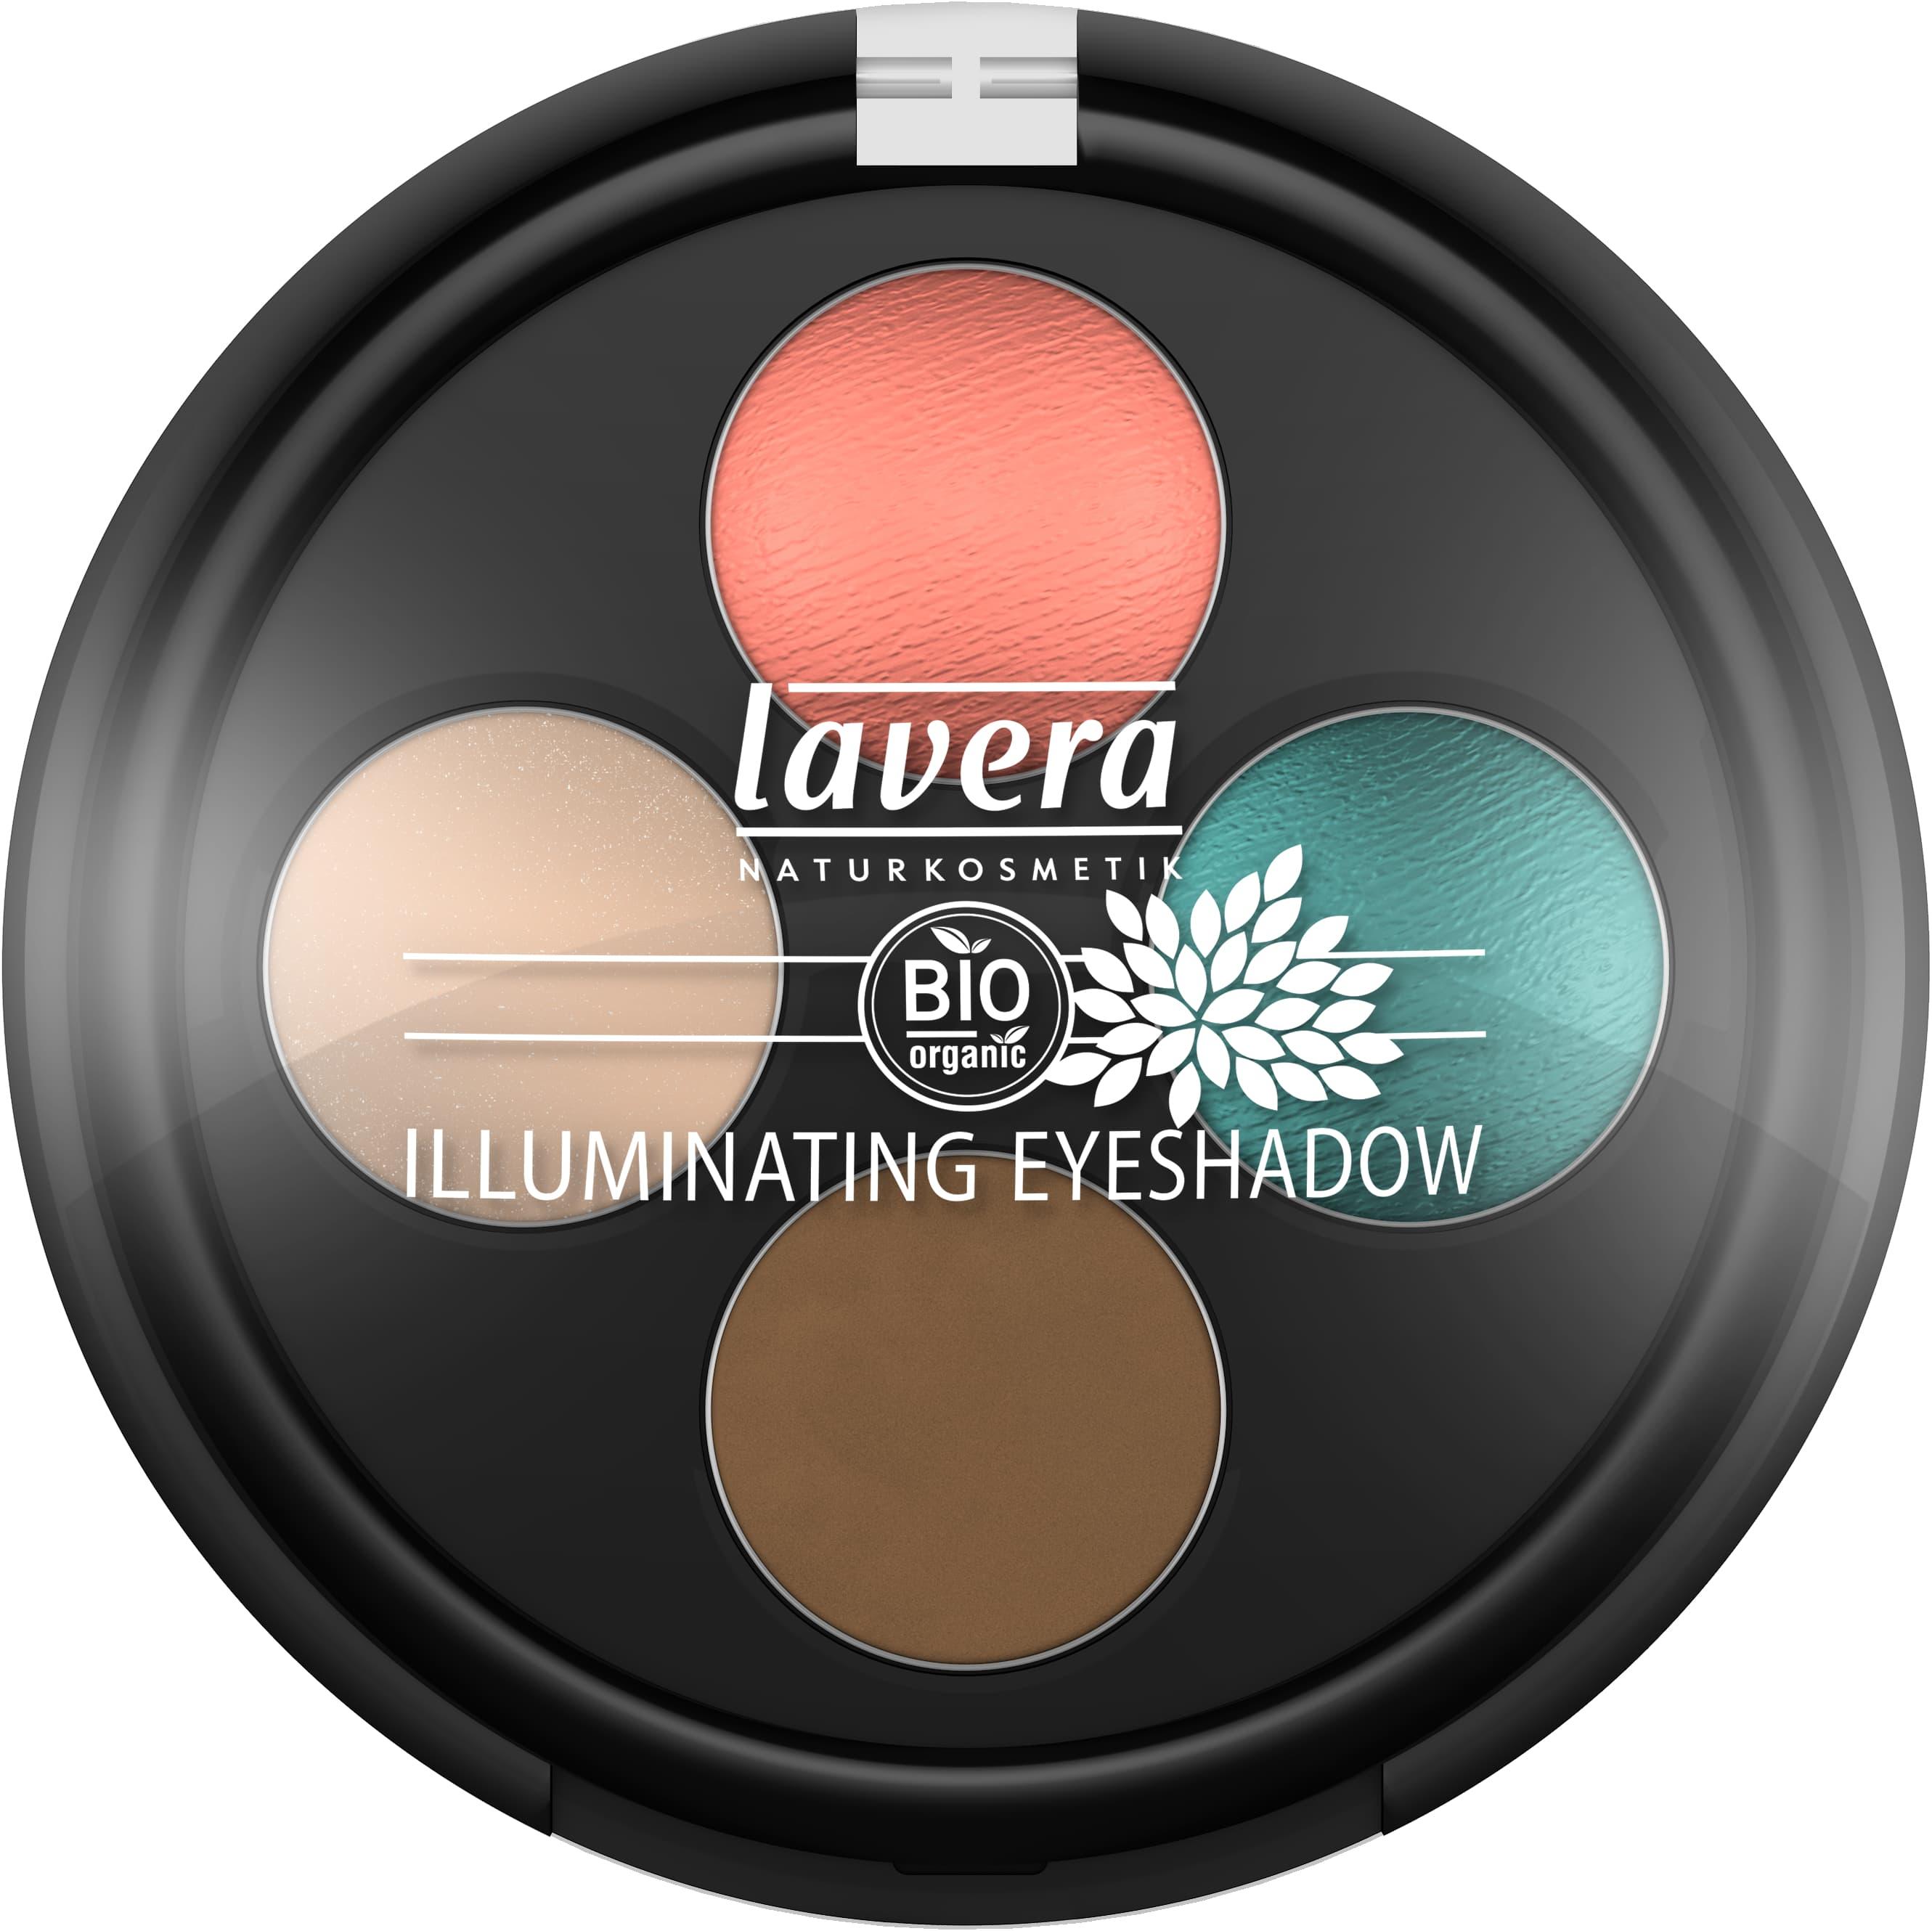 Illuminating Eyeshadow Quattro -Coral Touch 05-